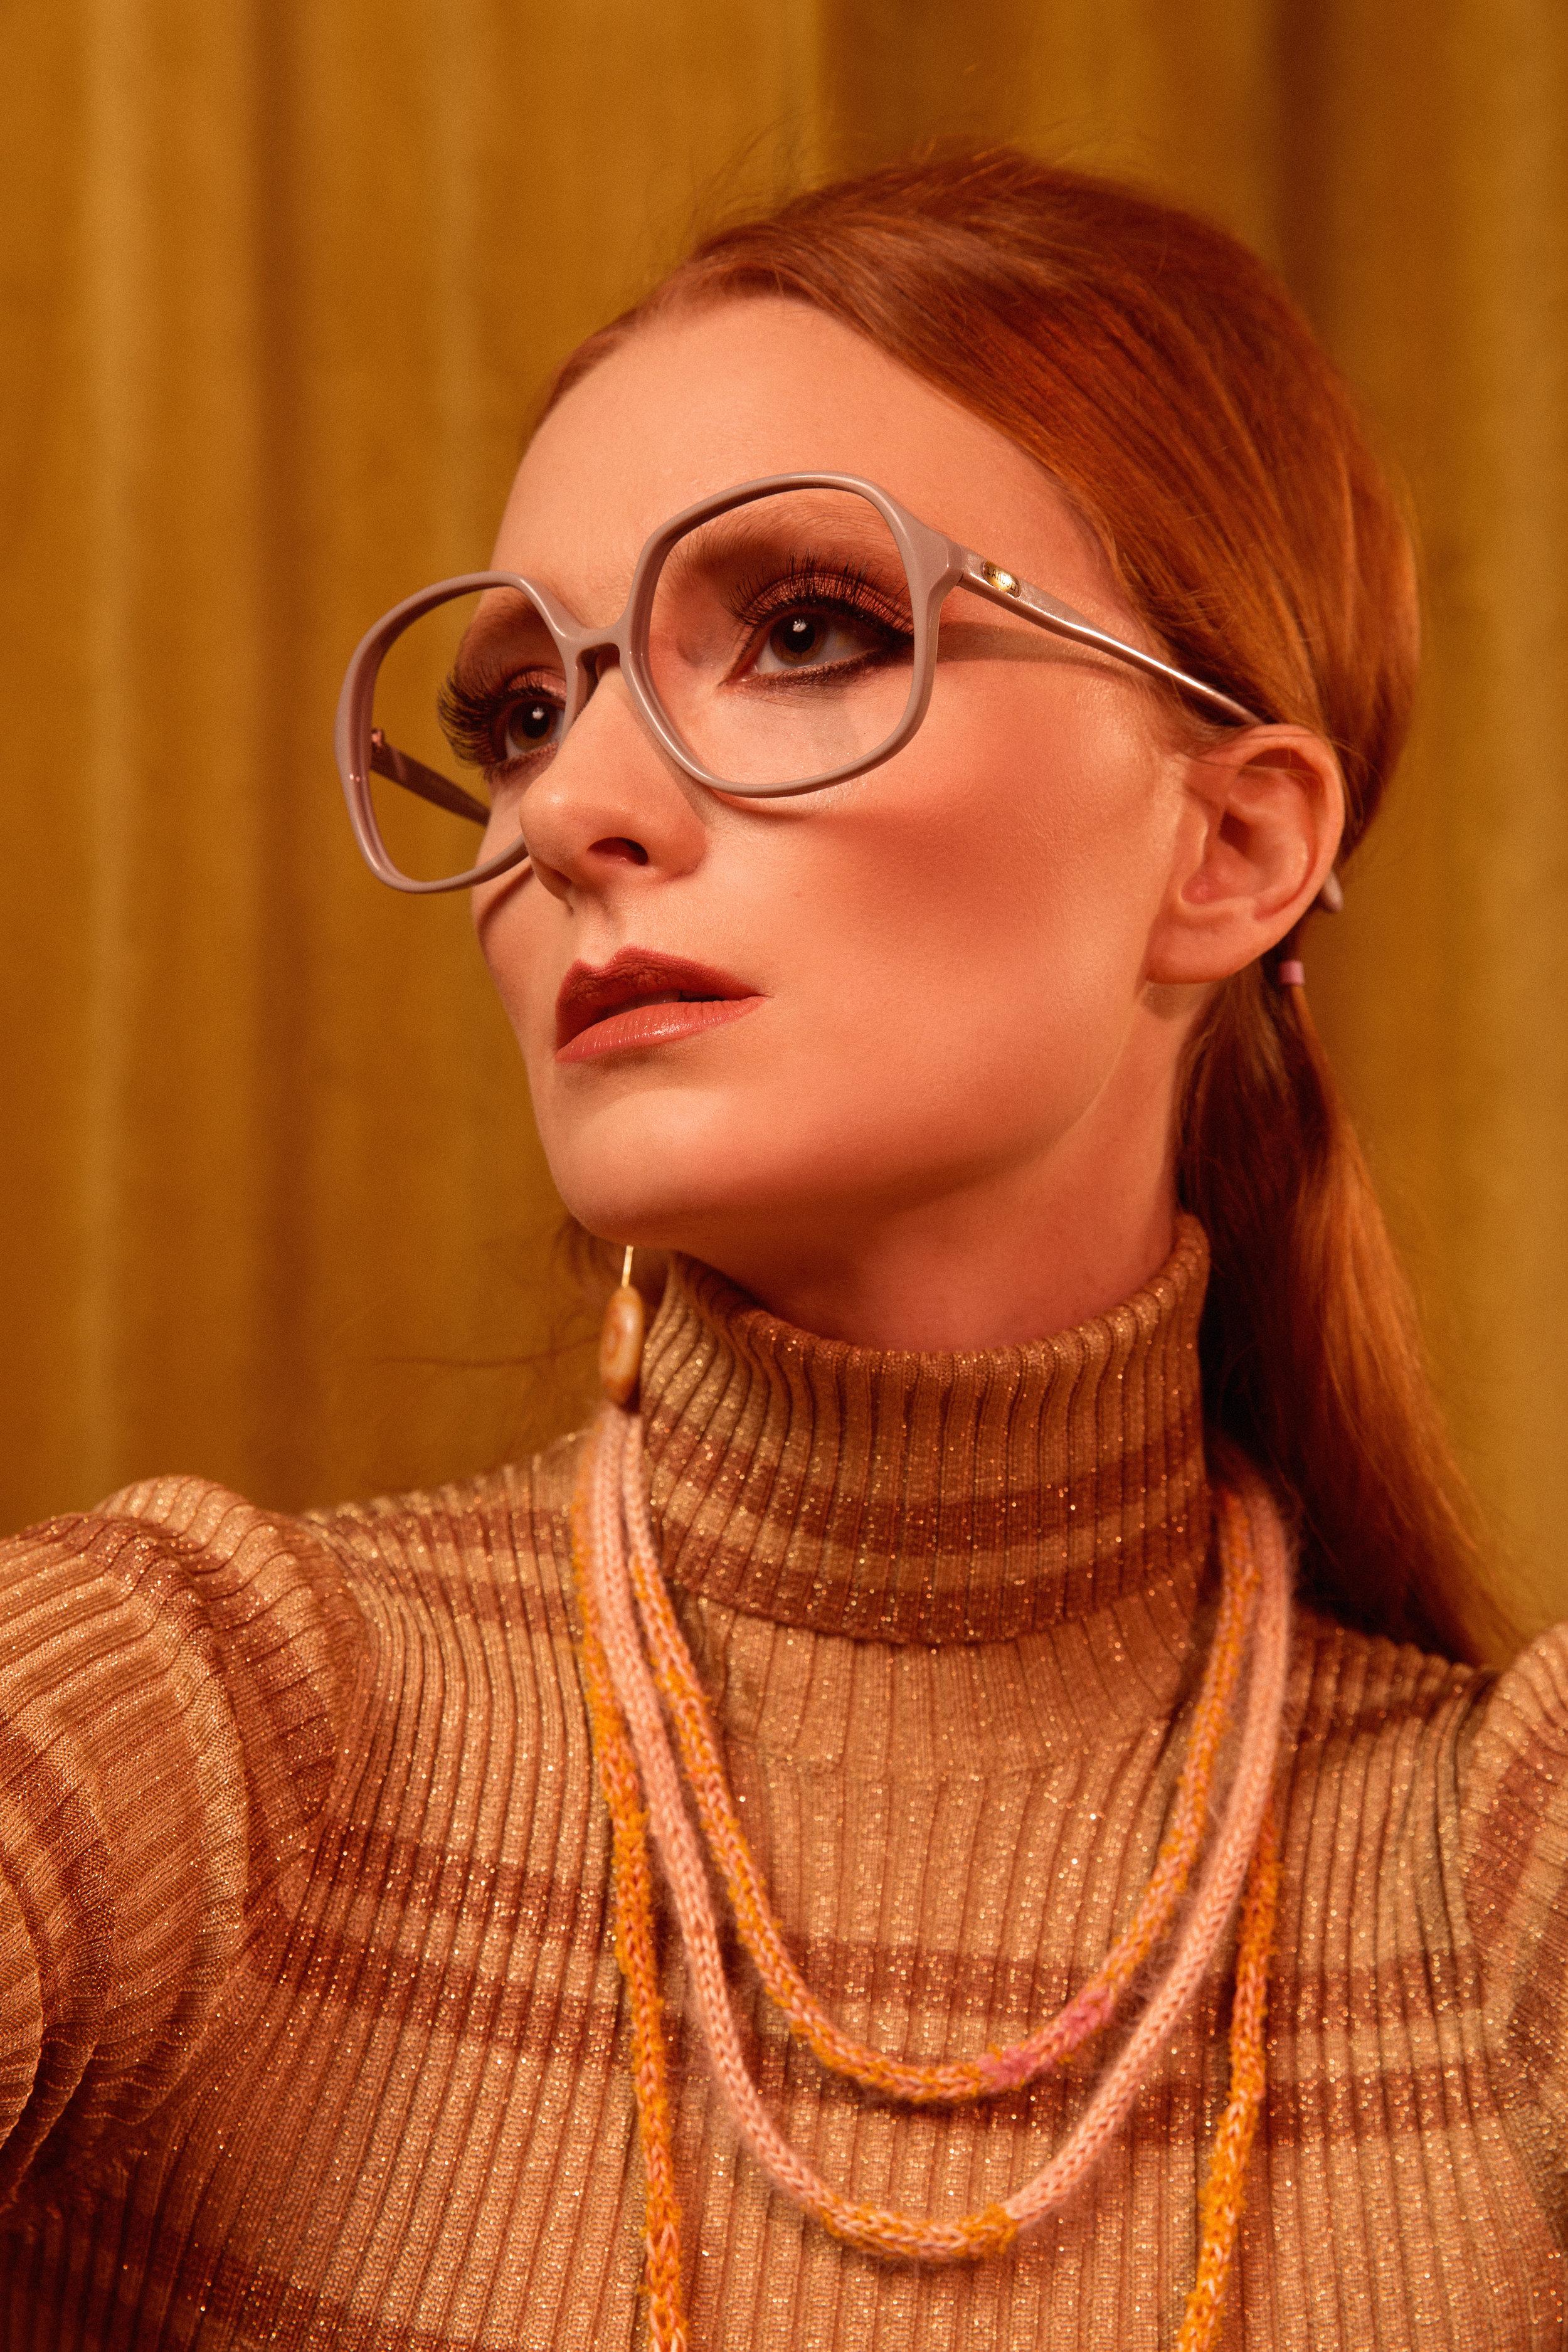 Turtleneck Gucci  Shoes Rachel Comey  Skirt: Chloe Dao  Earrings: Earthreverie  Socks: Asos  Necklace: Claire Drennan Knitwear